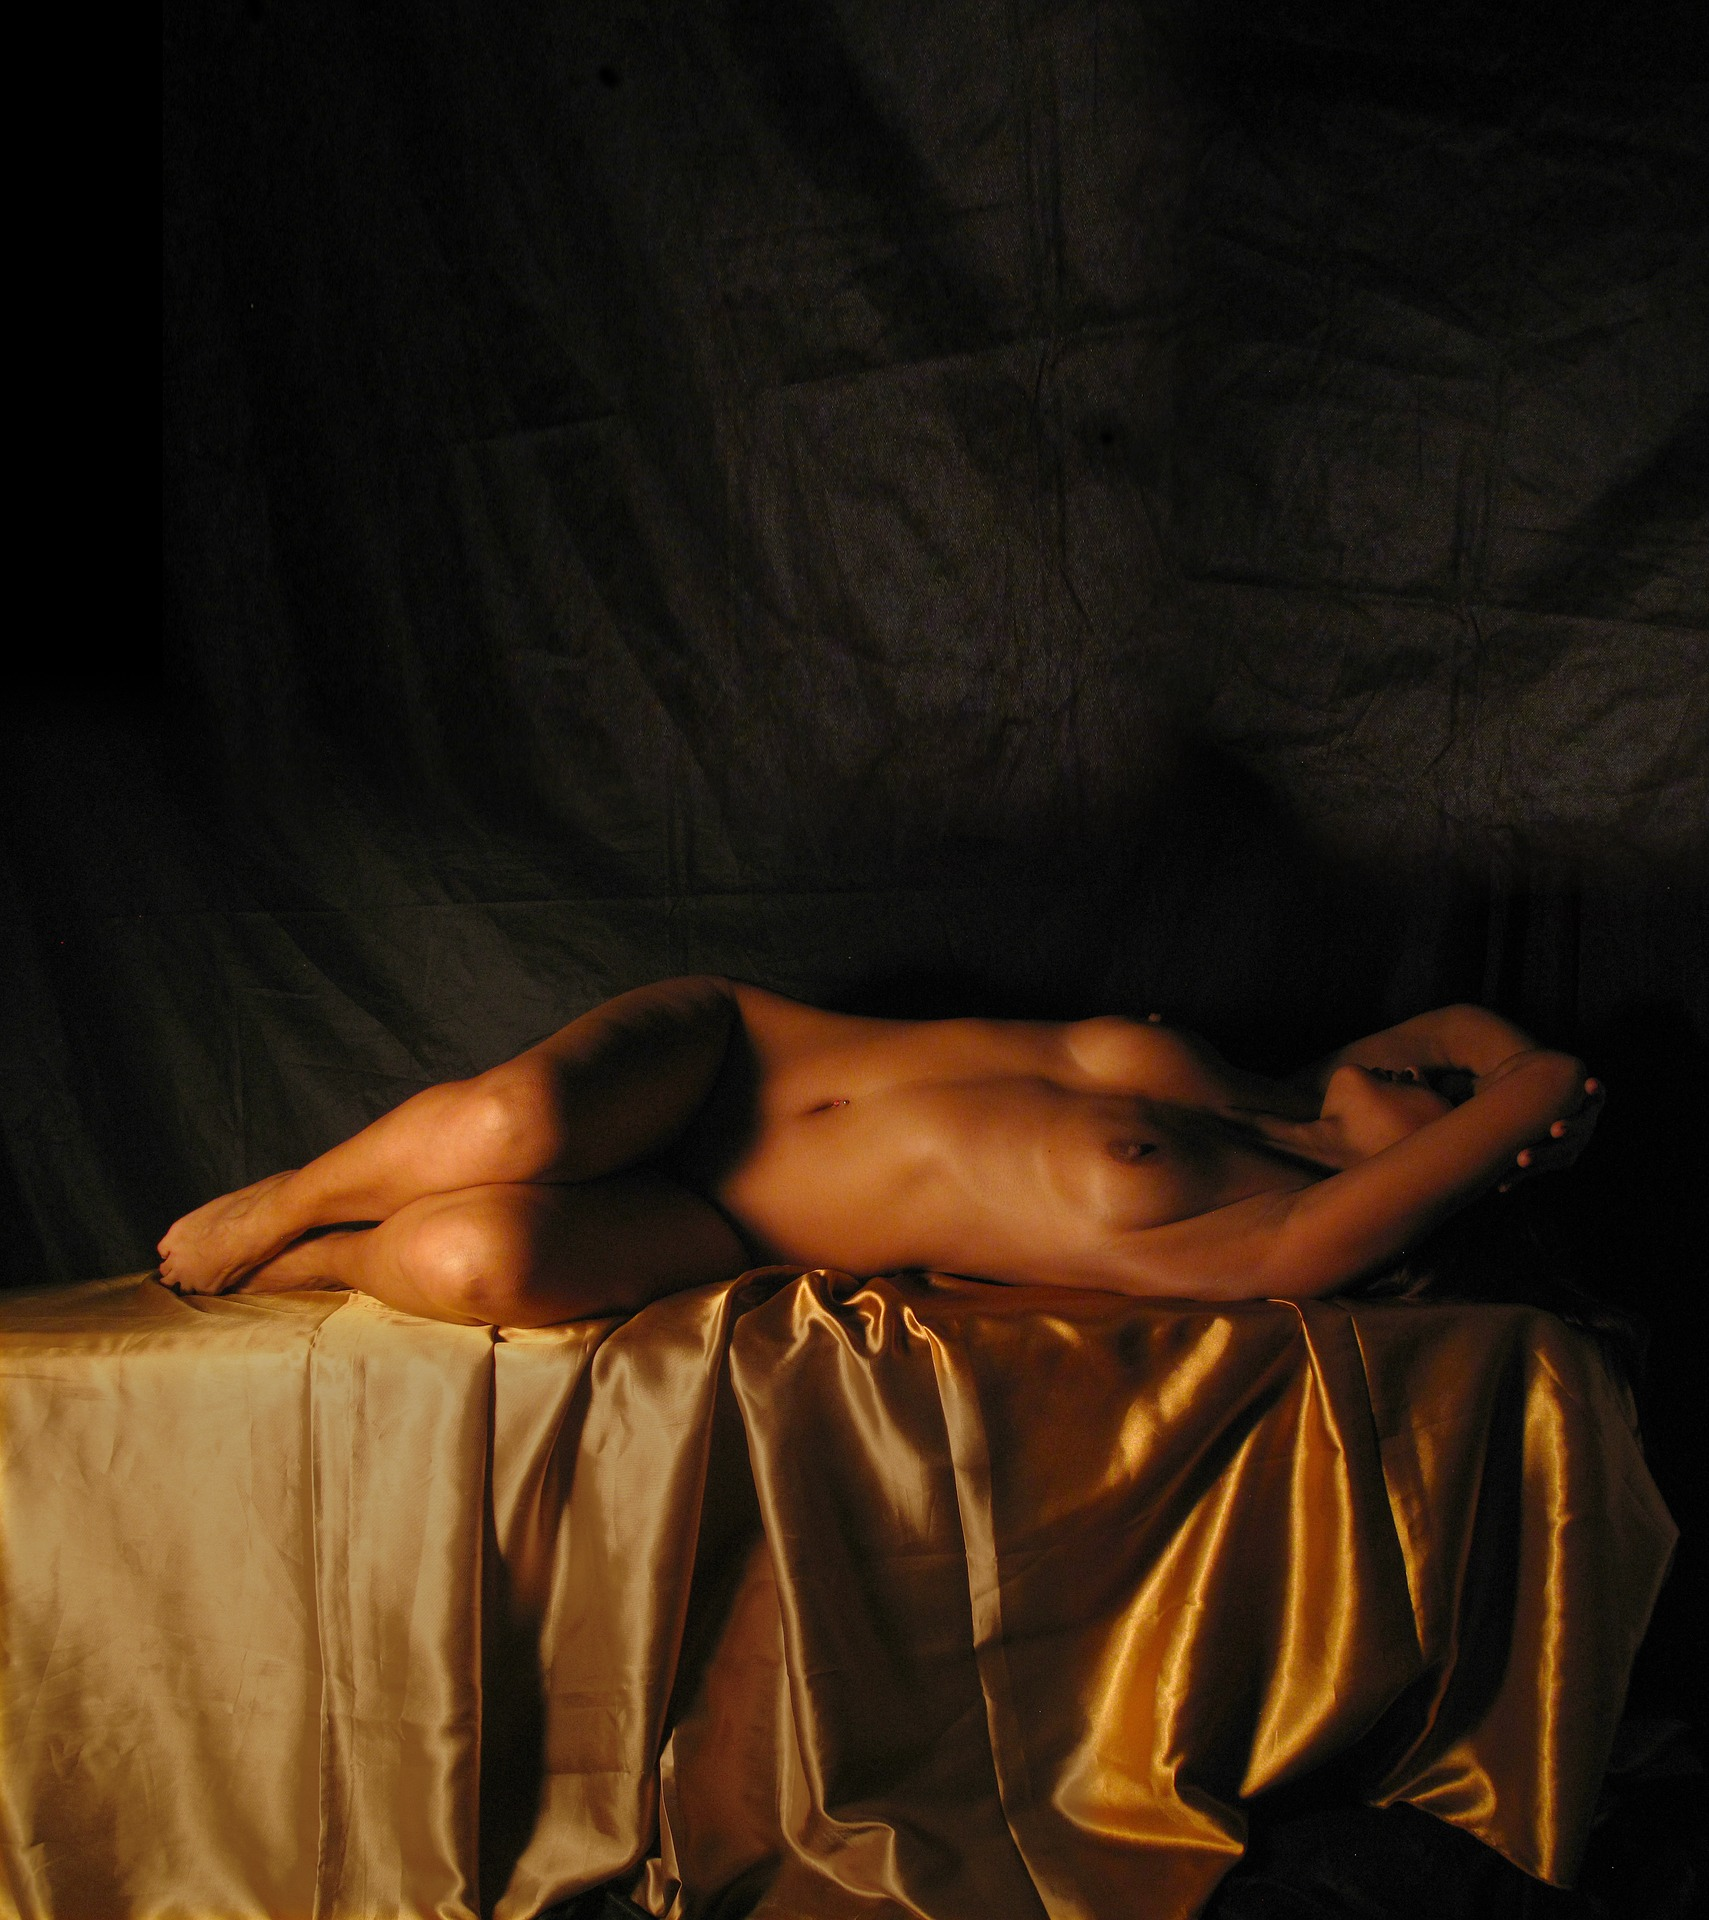 naked-woman-g898eb8fd8_1920